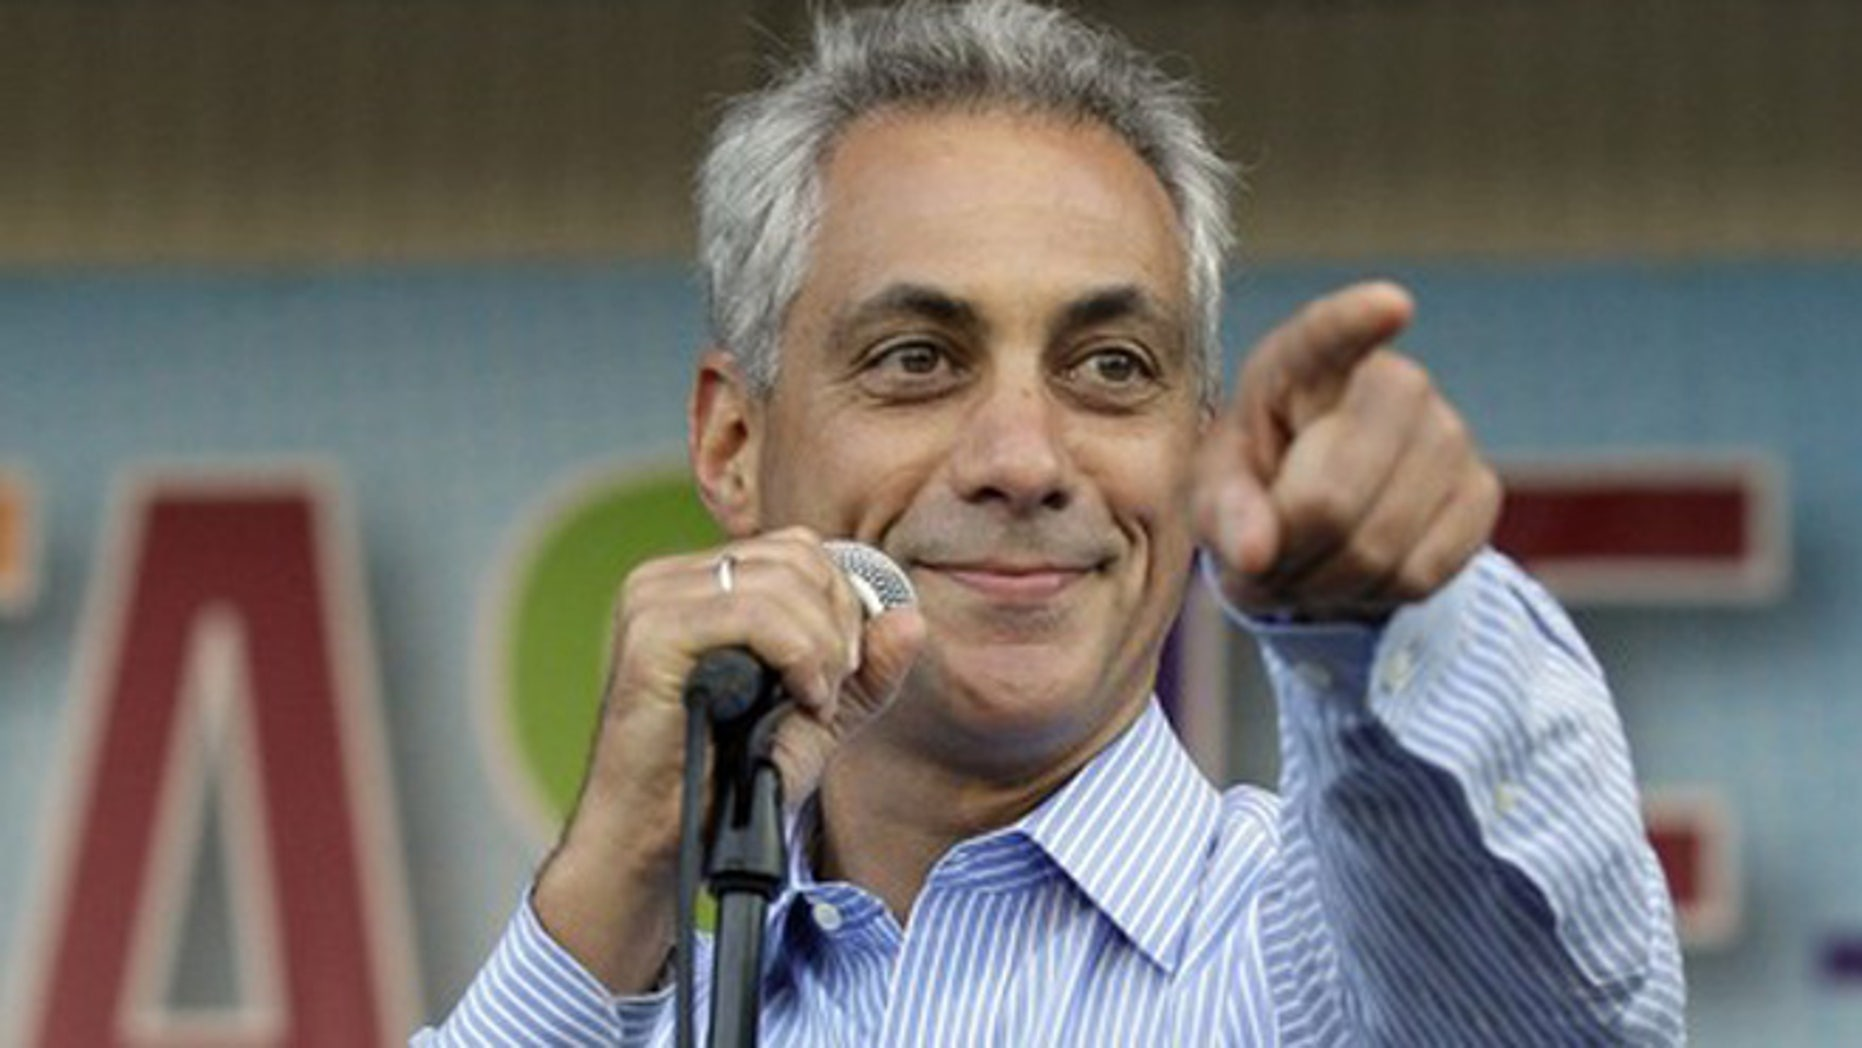 July 11, 2012: Chicago Mayor Rahm Emanuel speaks during Taste of Chicago.